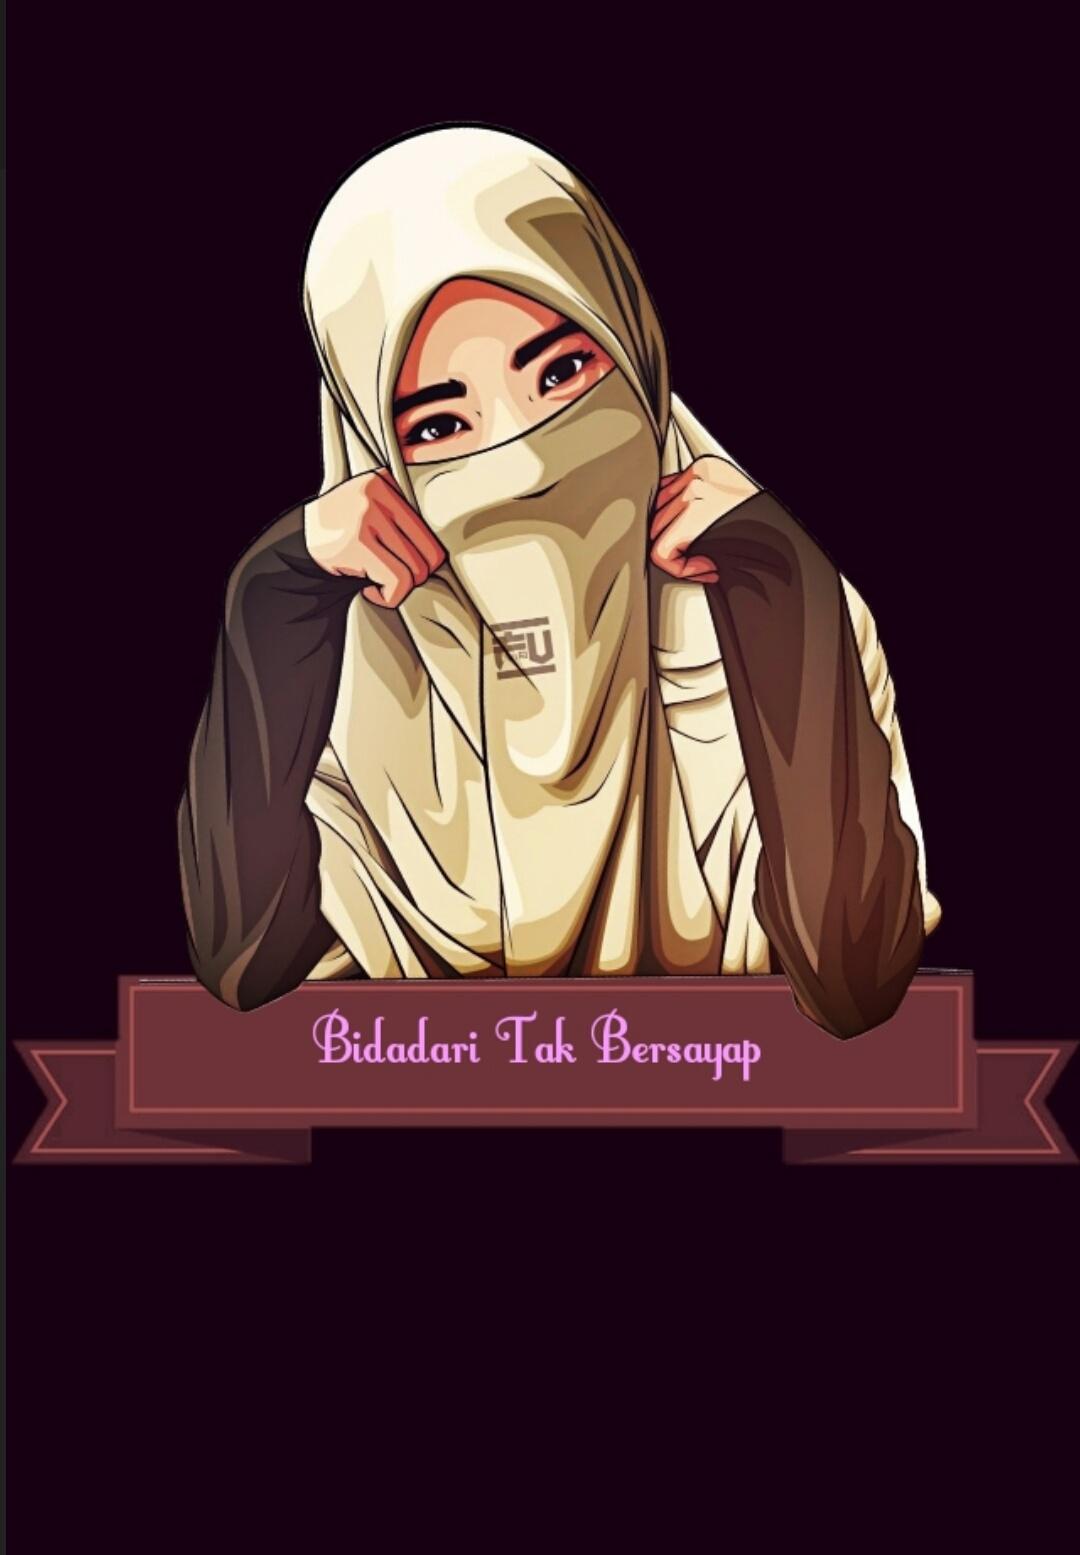 Wallpaper Anime Hijab Wallpaper Anime Gratis